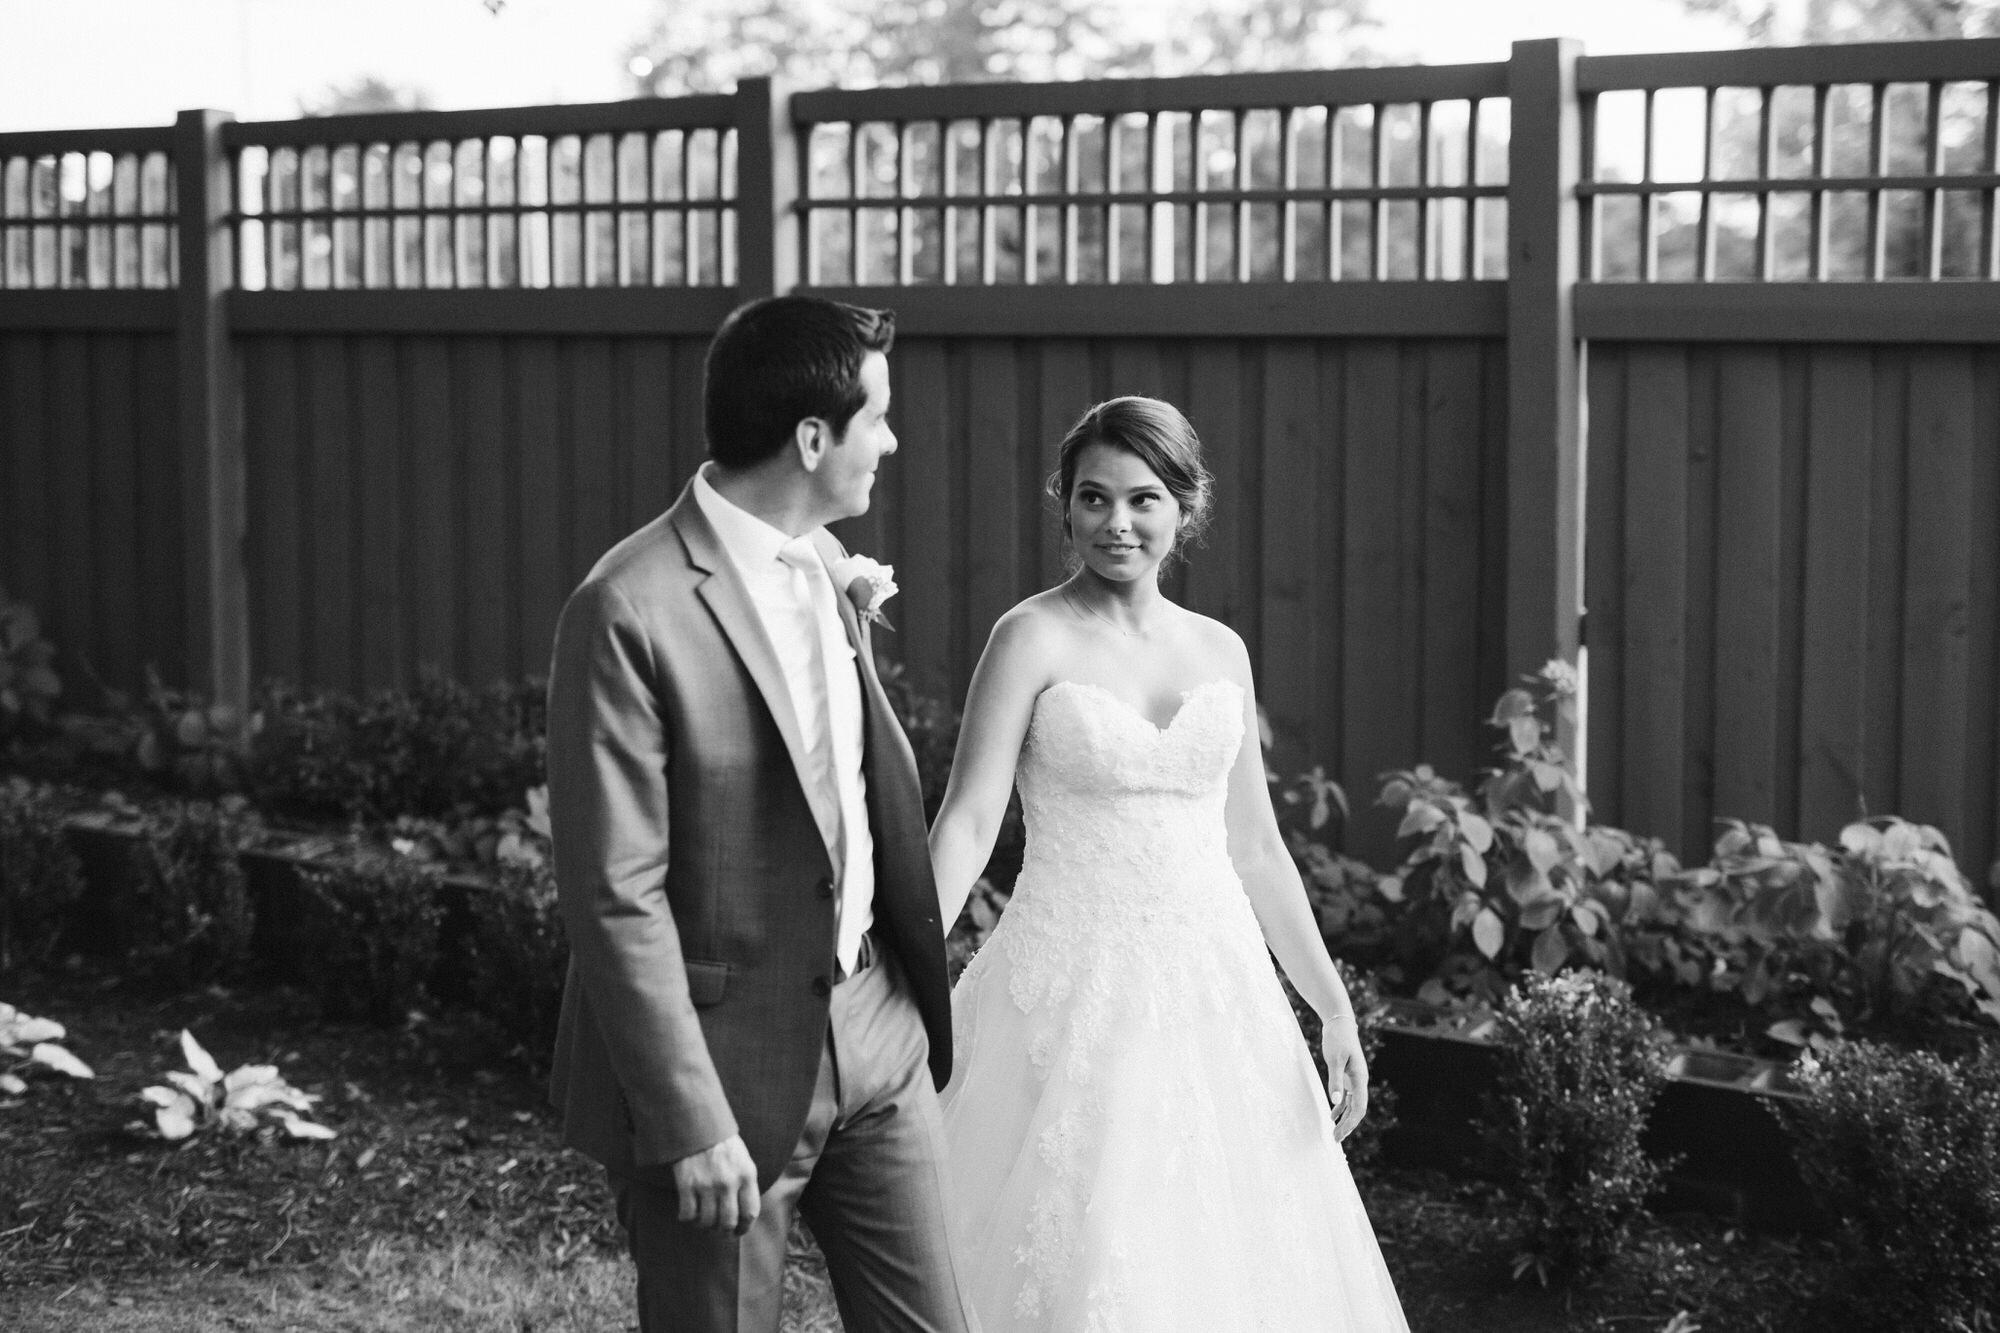 twigs-tempietto-wedding-greenville-downtown-367.JPG